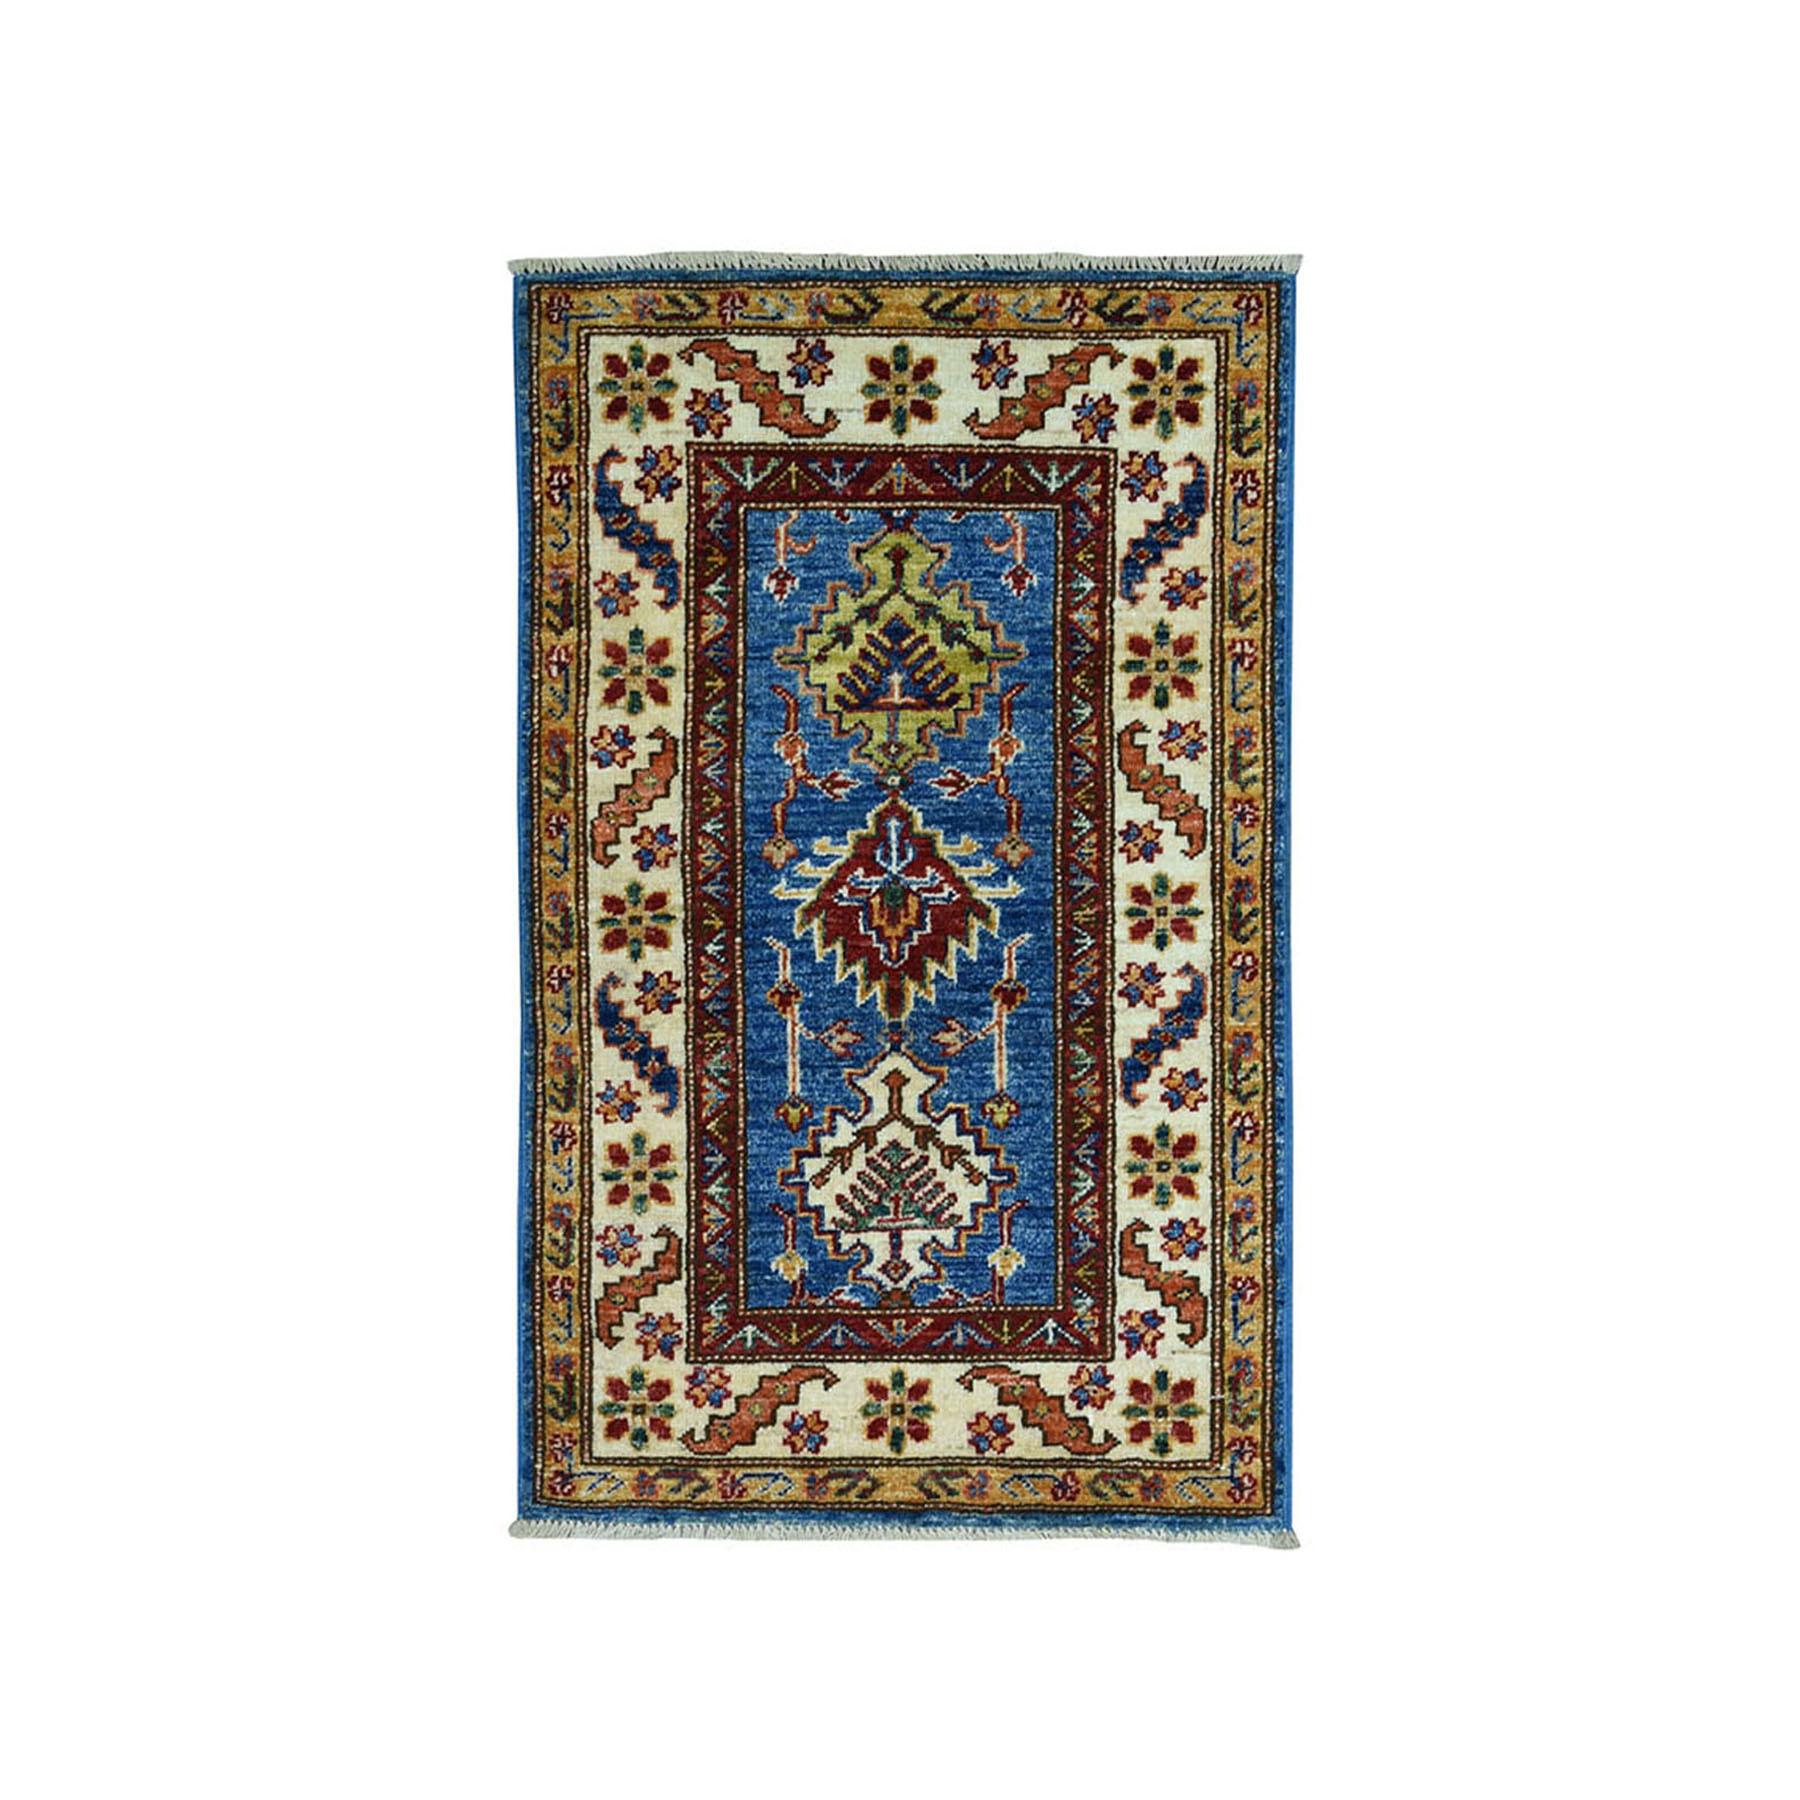 "2'X3'2"" Blue Super Kazak Pure Wool Geometric Design Hand-Knotted Oriental Rug moae090e"